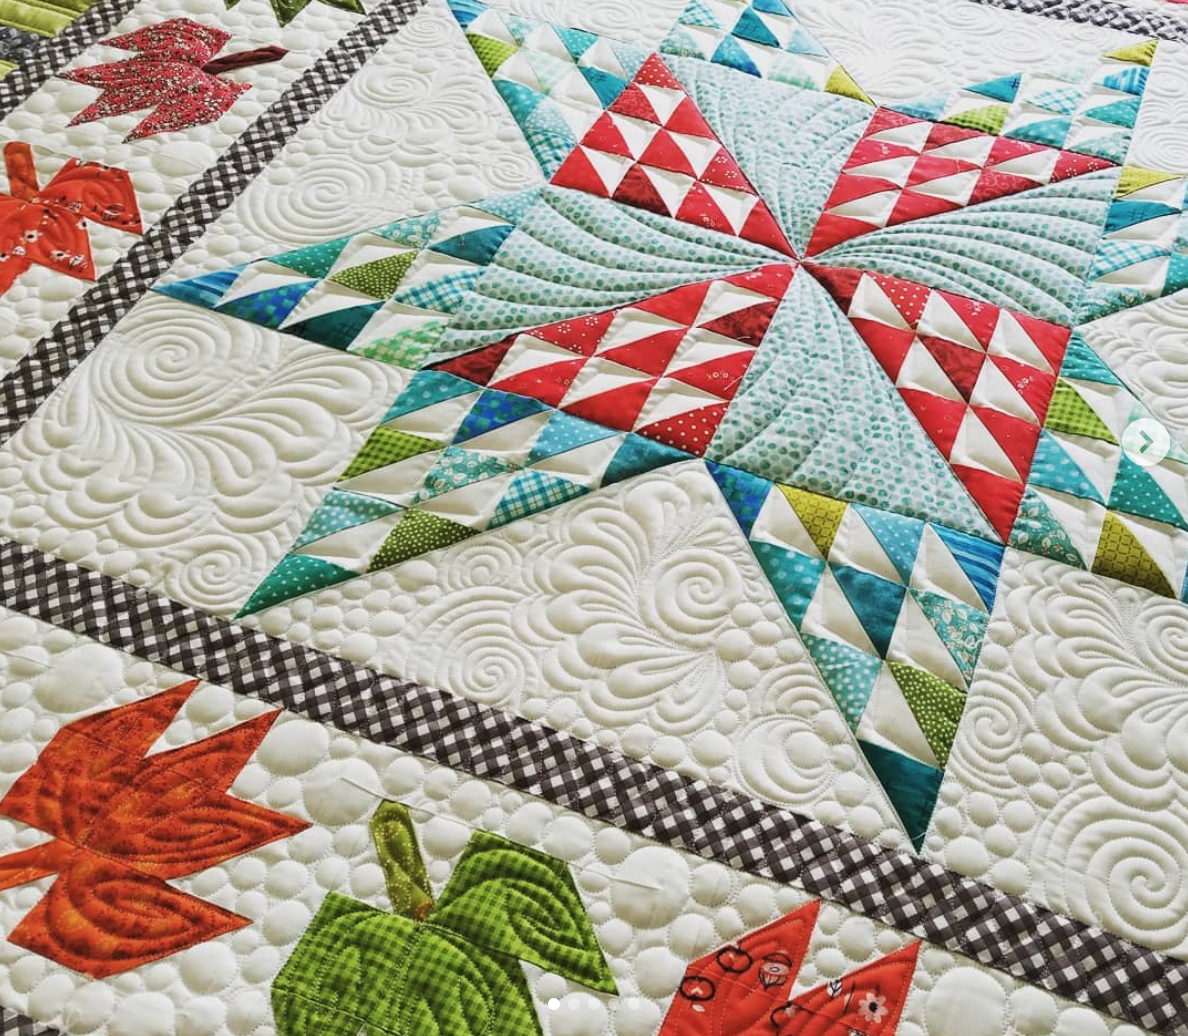 Autumnville quilt